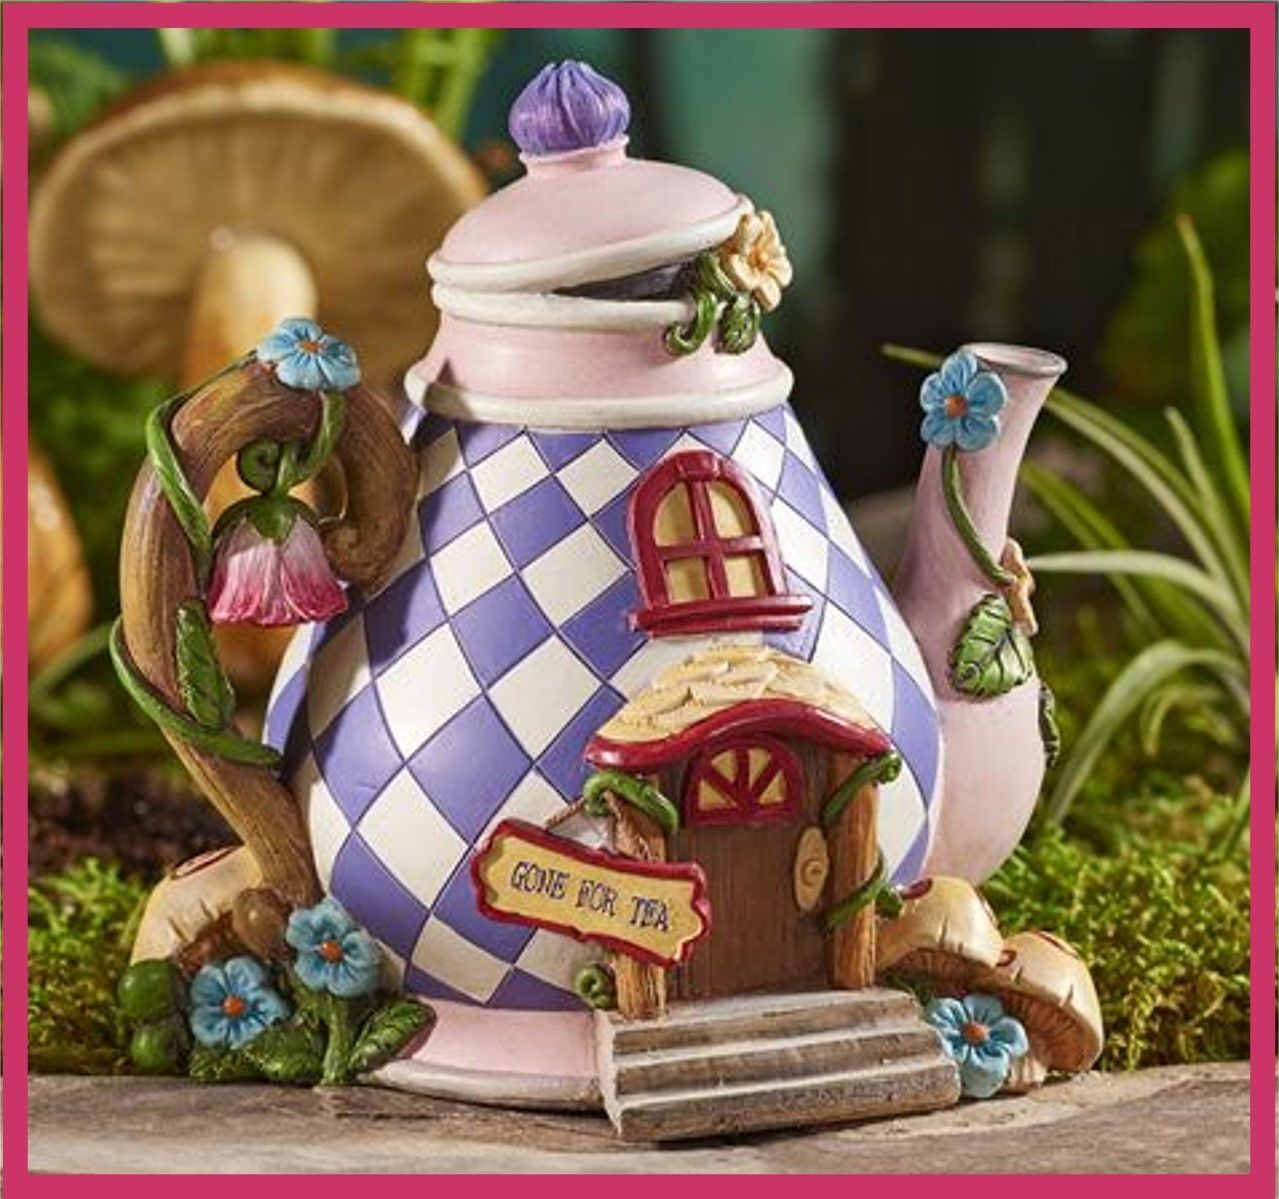 fairy garden fun mini alice in wonderland teapot tea pot fairy house 325 miniature gardens. Black Bedroom Furniture Sets. Home Design Ideas